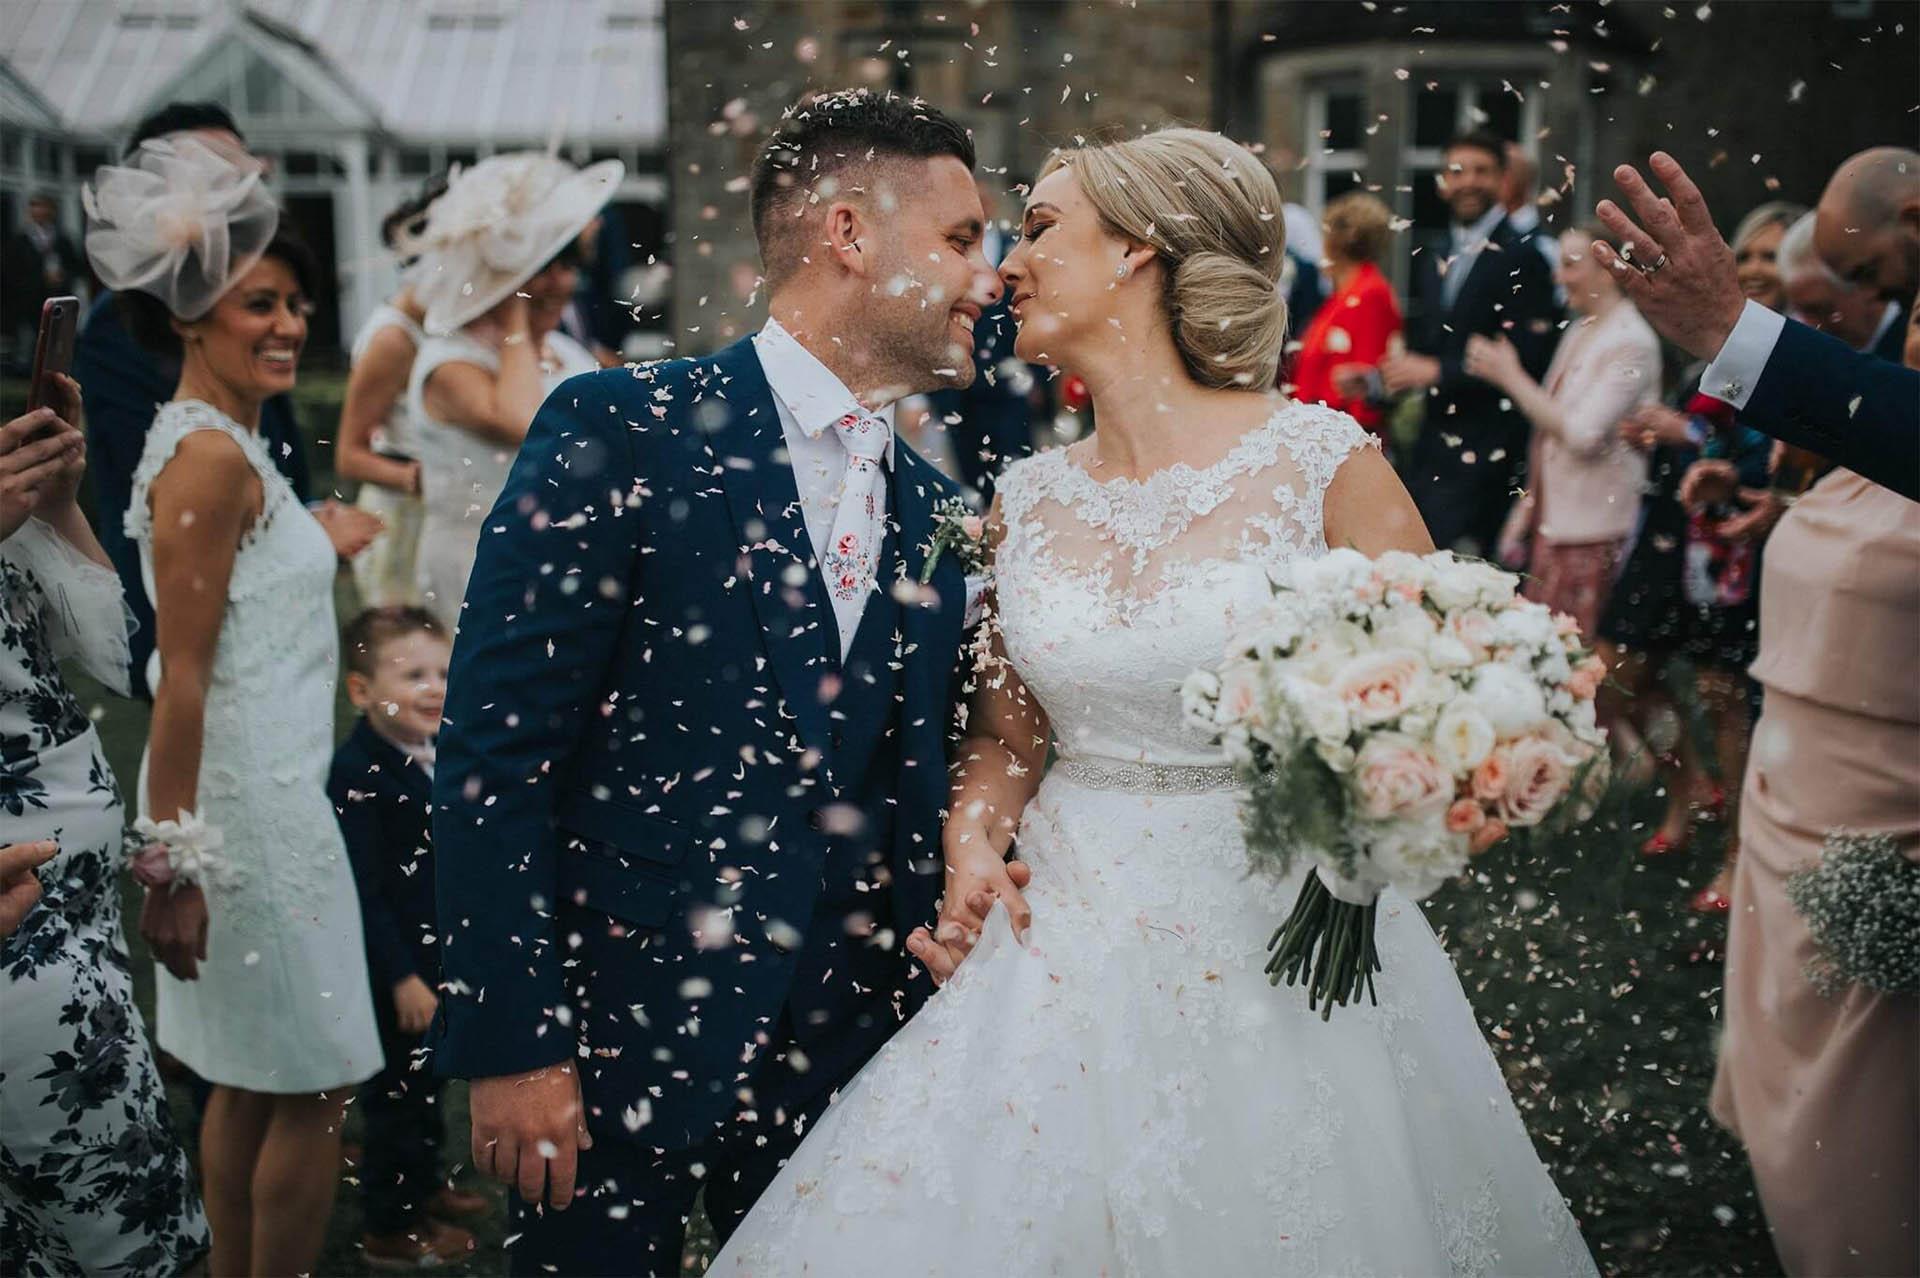 wedding-photographer-and-videographer-bryngarw-house-brynmenyn-bridgend-uk-04